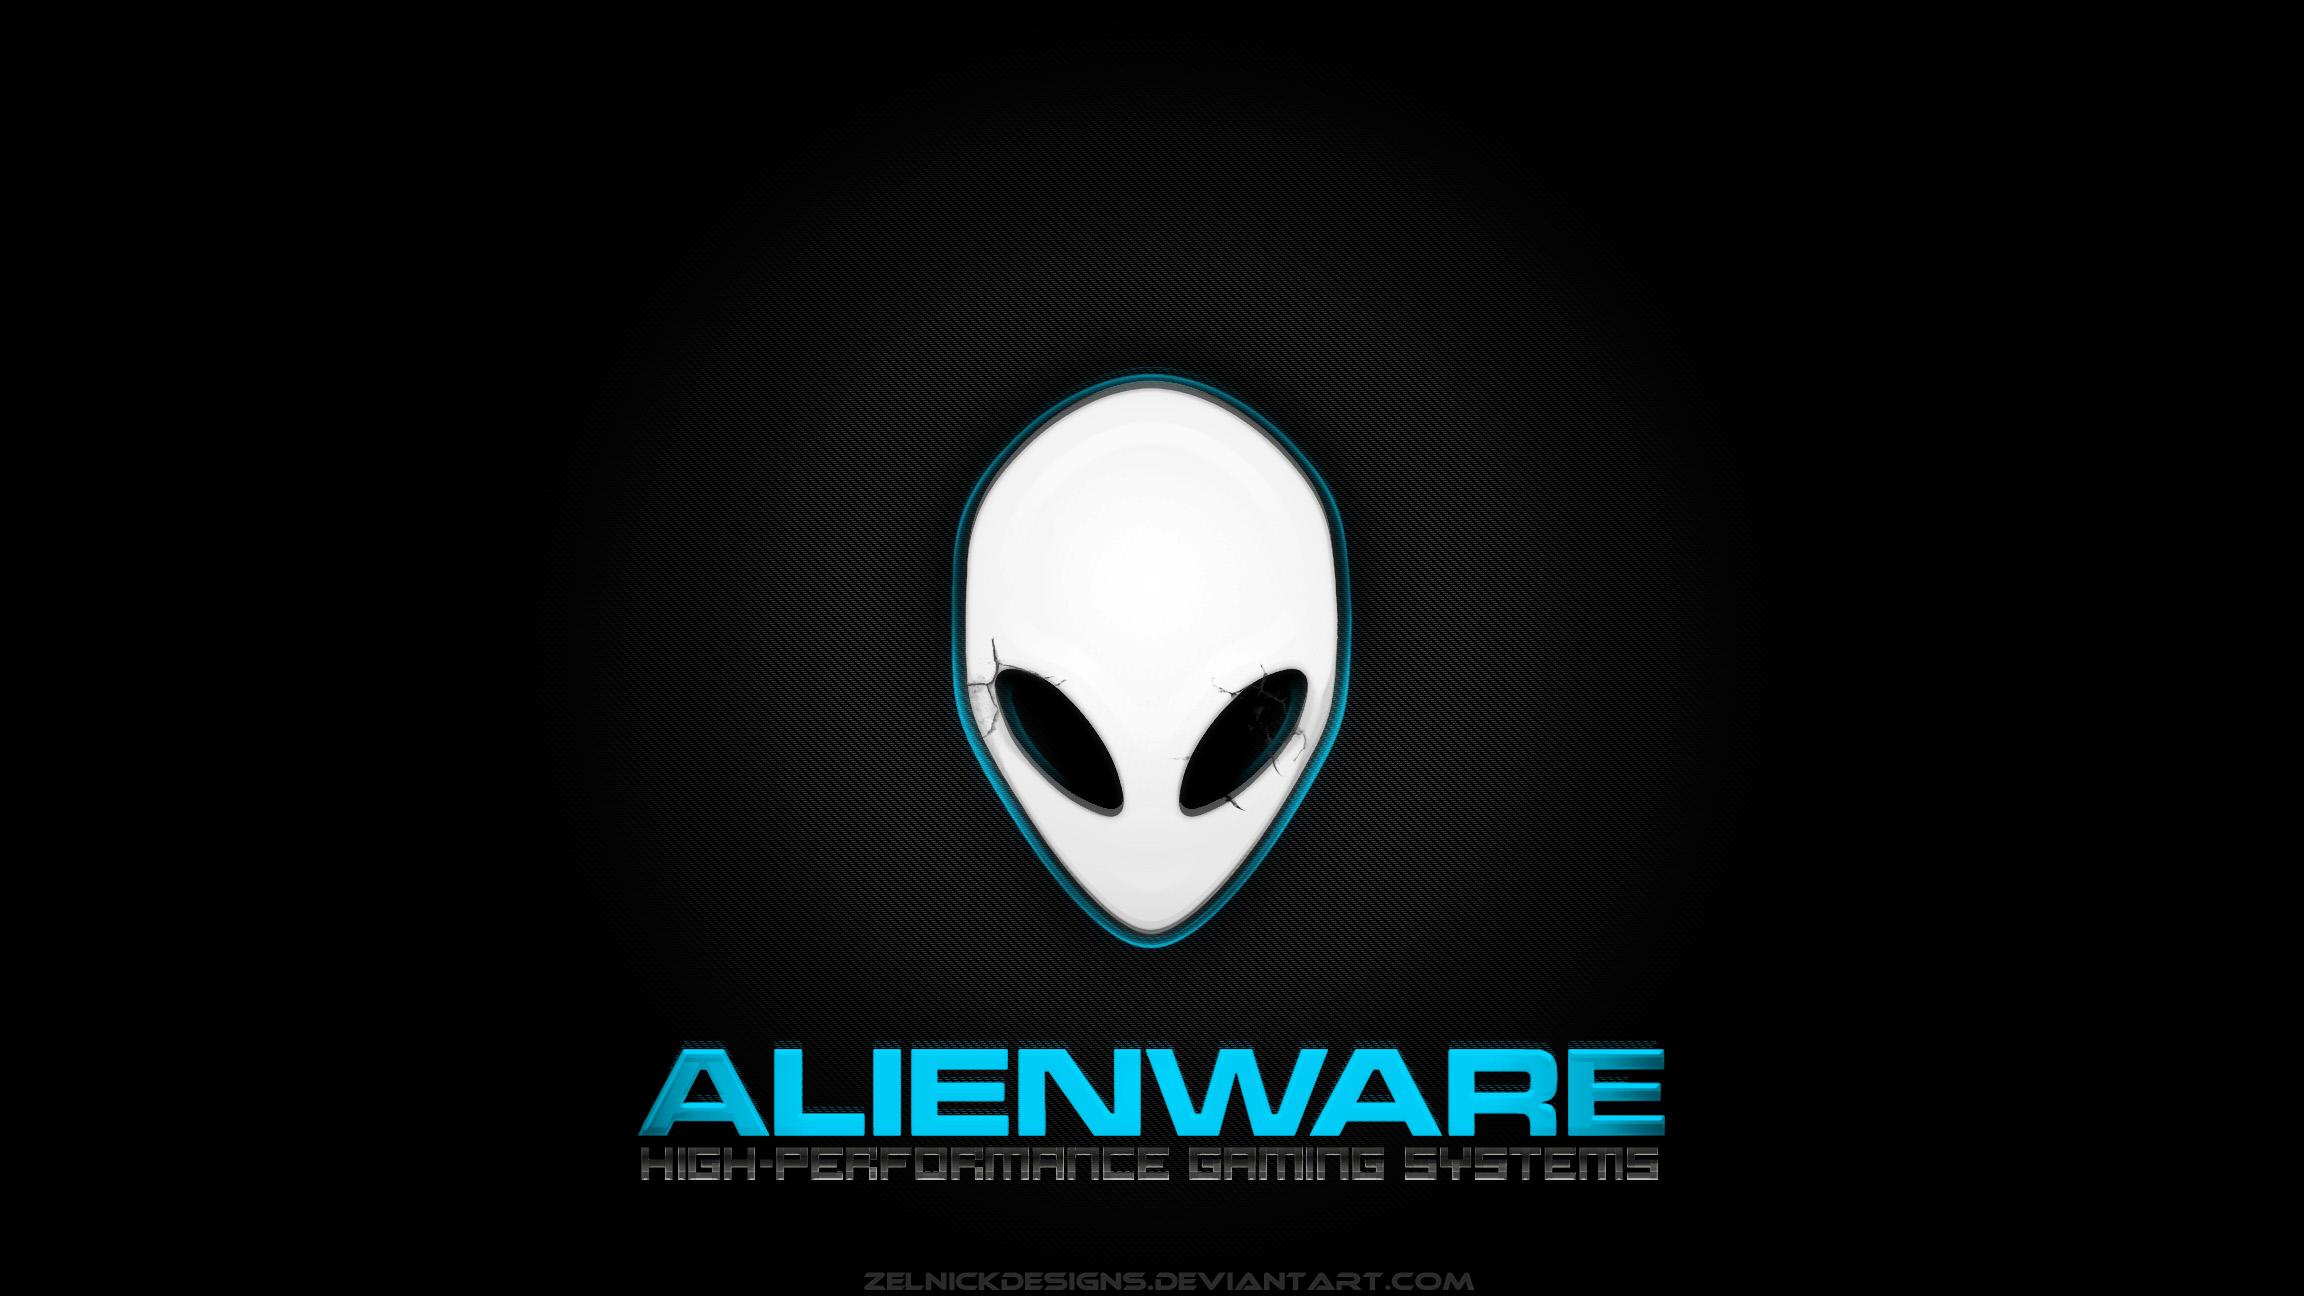 alienware wallpaper pack v2 by zelnickdesigns customization wallpaper 2304x1296